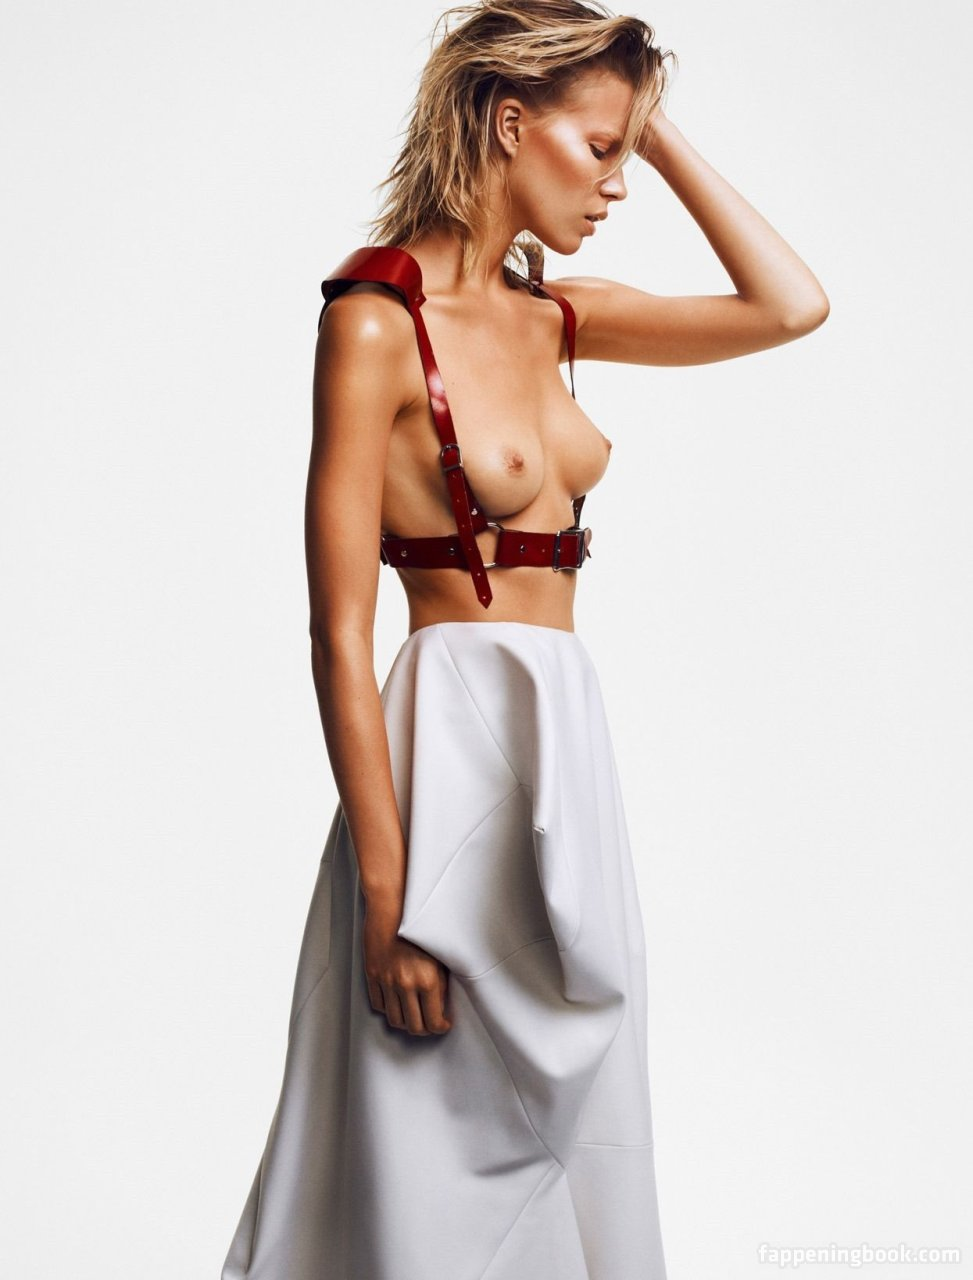 Karen Tomlin  nackt